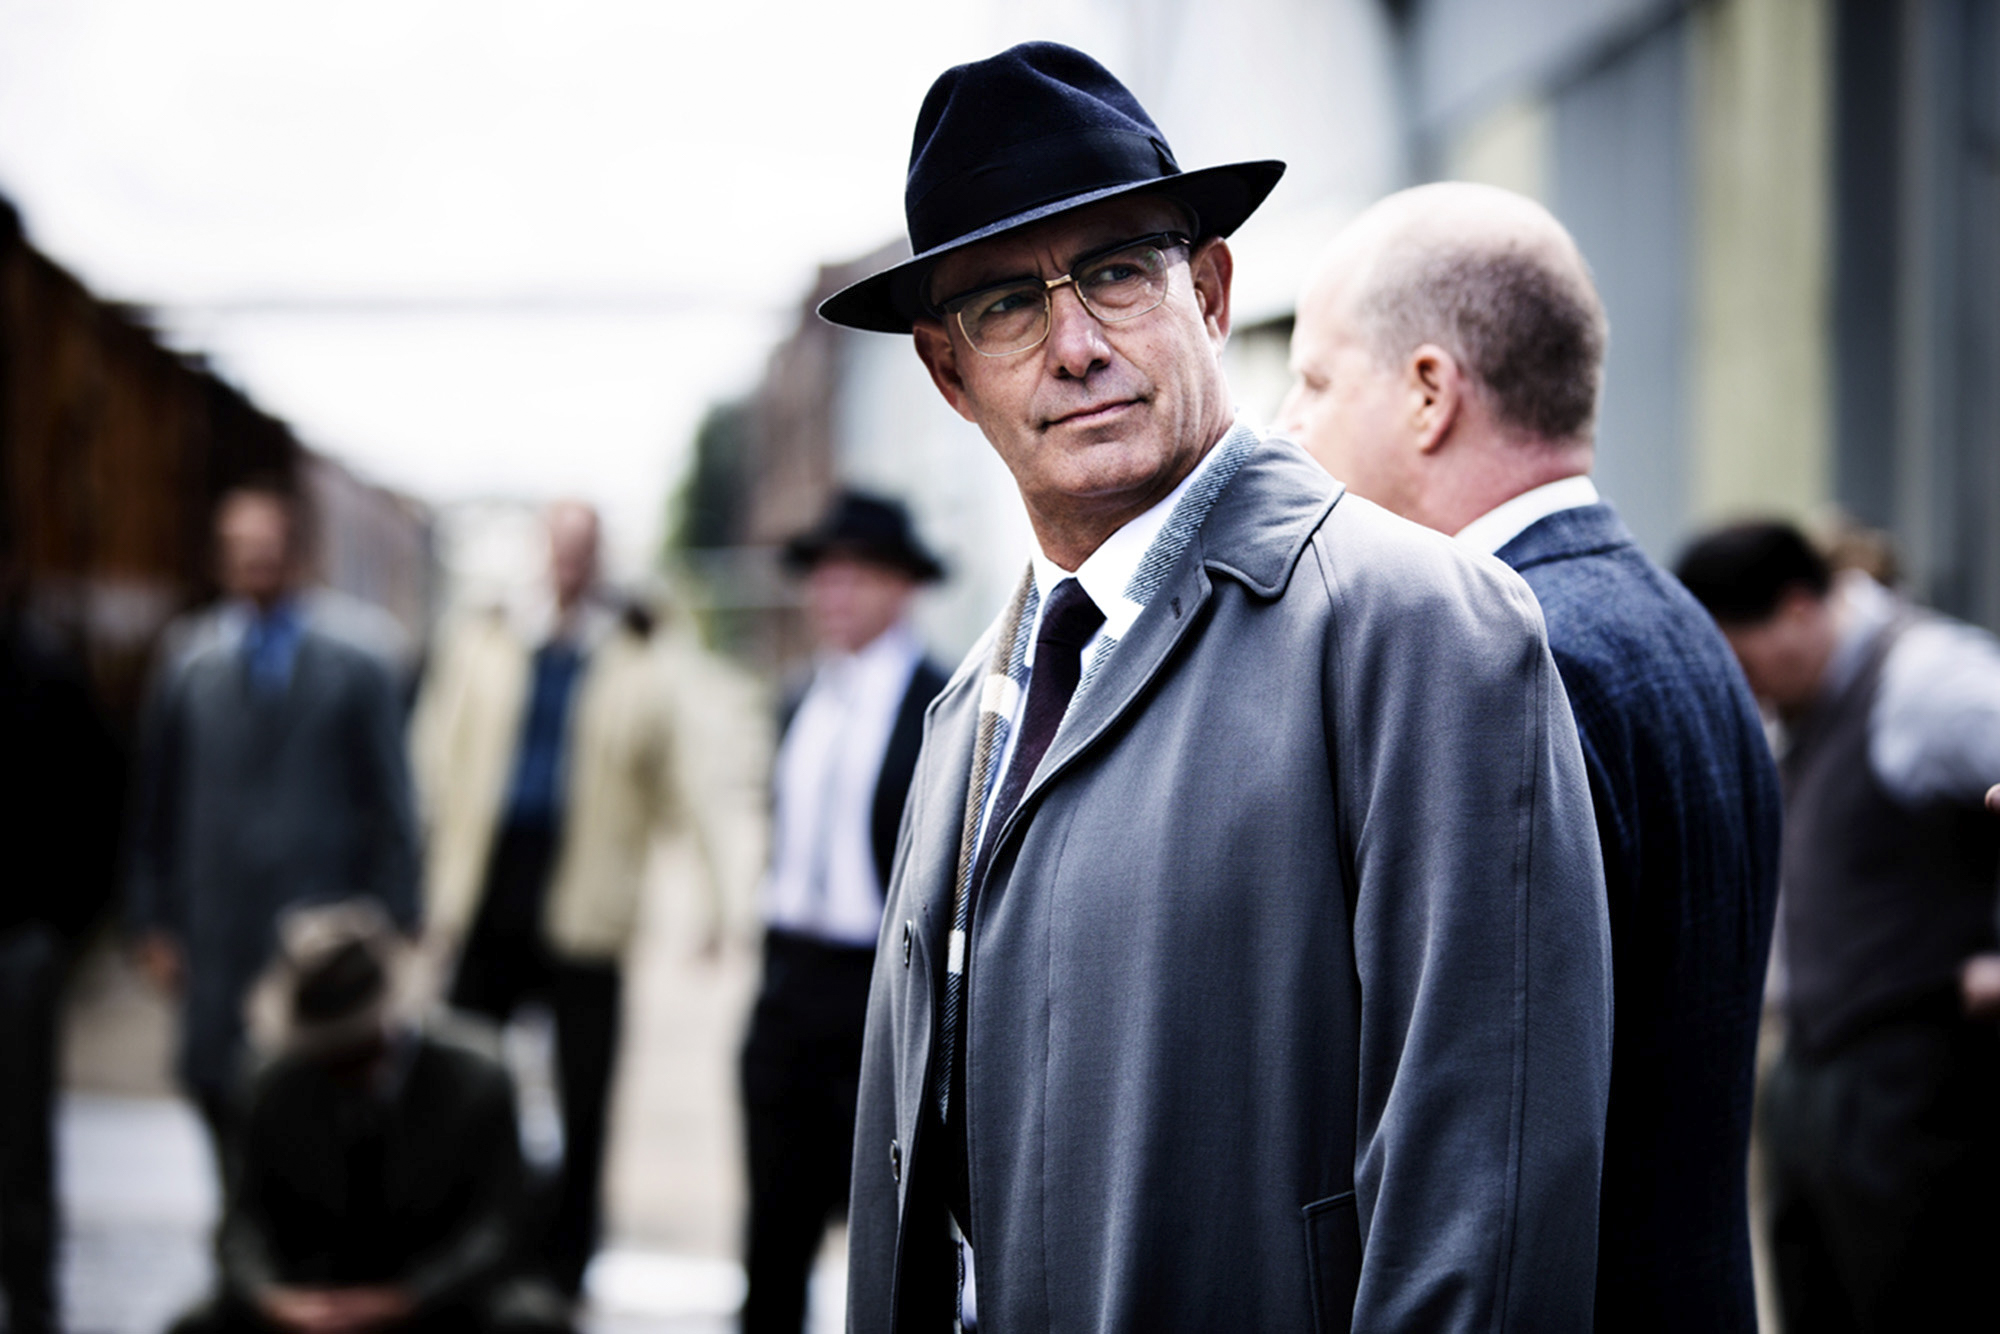 Dr Blake Mysteries